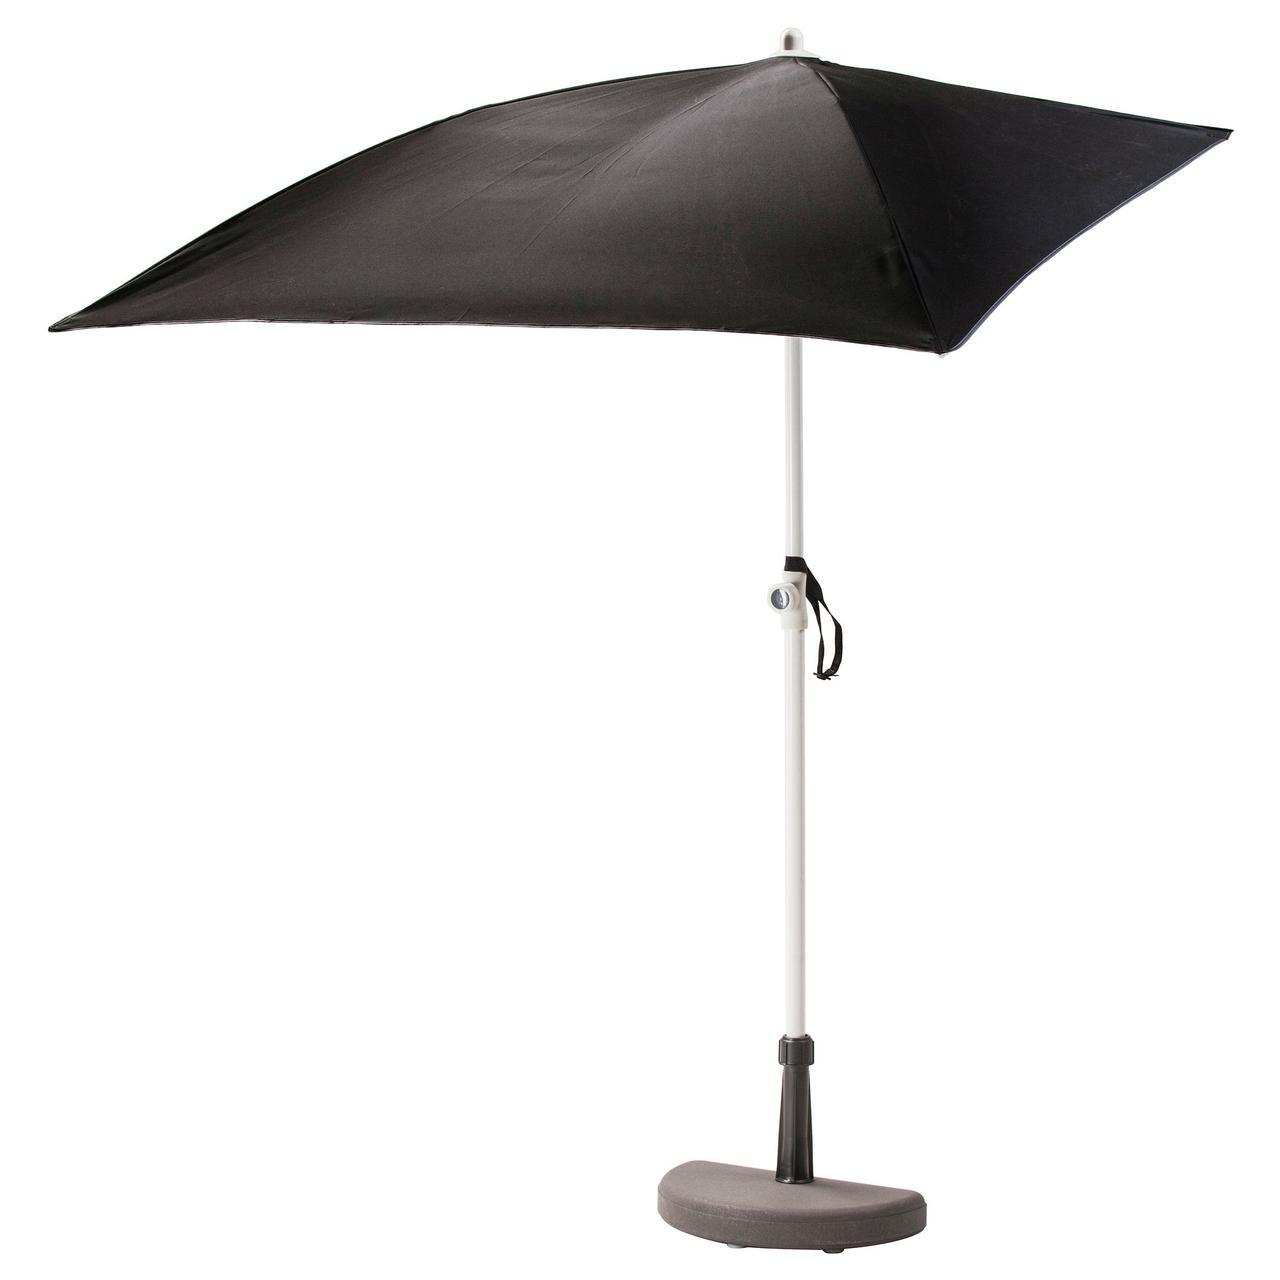 БРАМСОН / ФЛИСО Зонт от солнца с опорой, черный